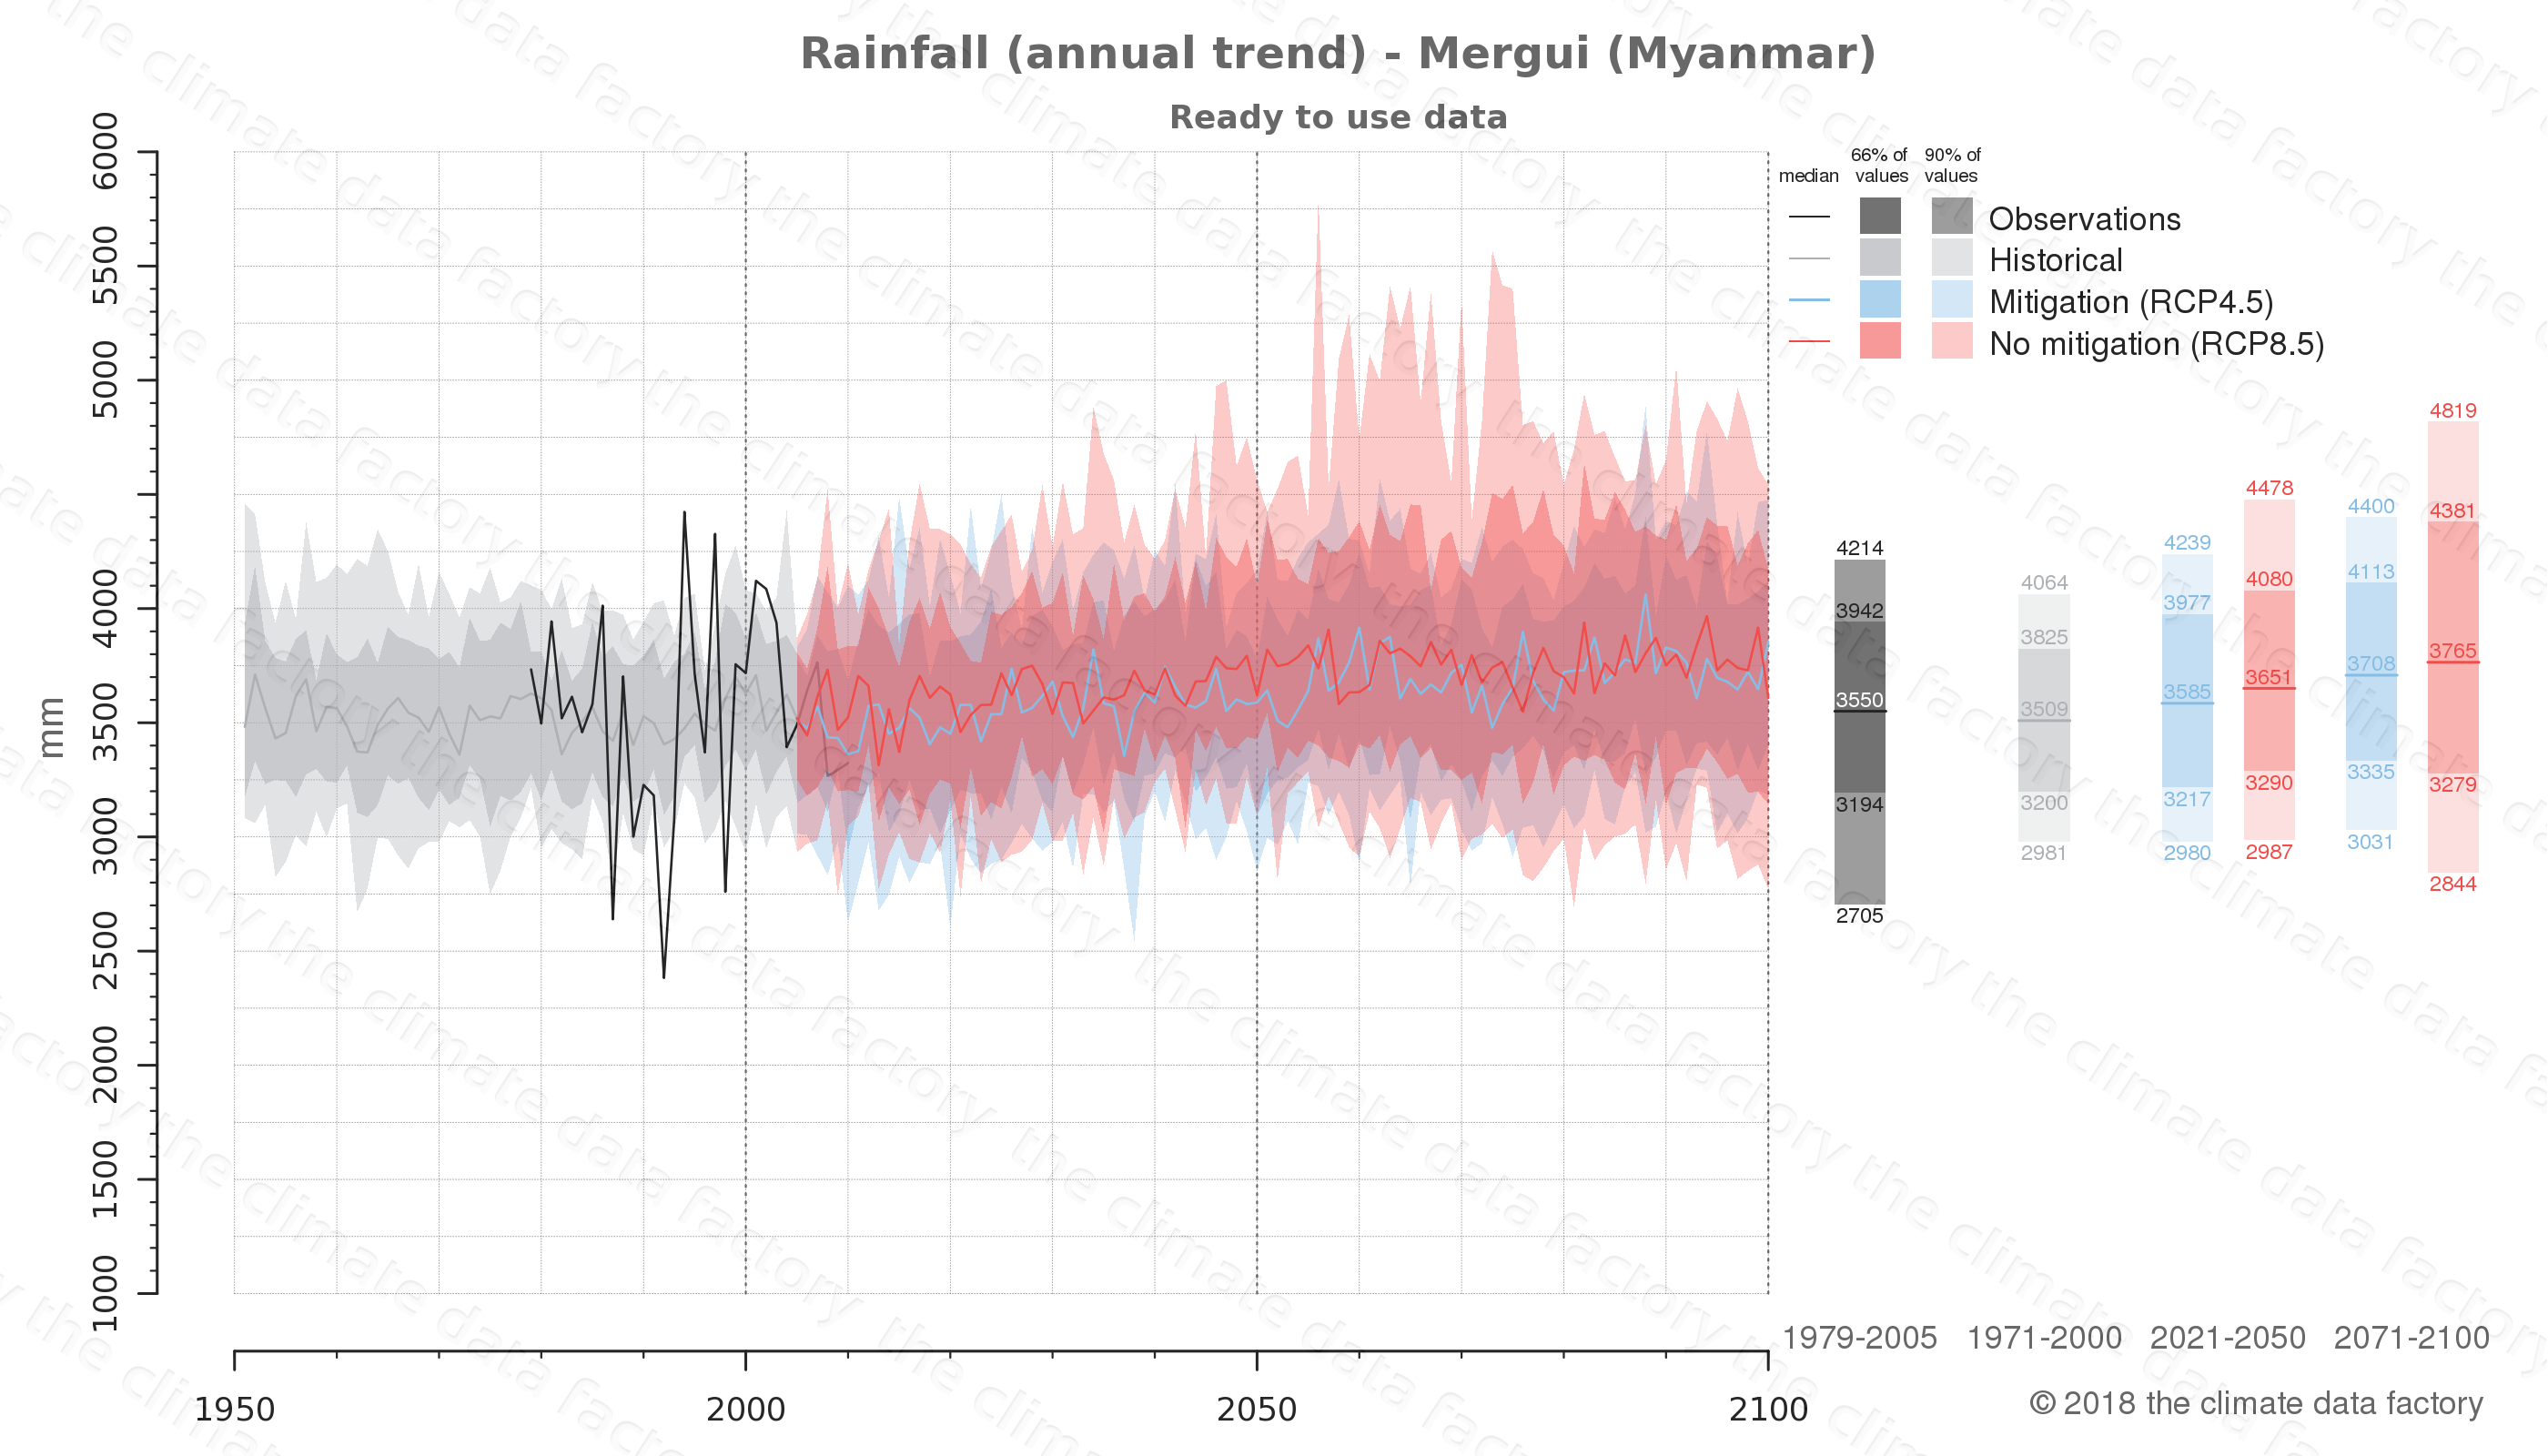 climate change data policy adaptation climate graph city data rainfall mergui myanmar